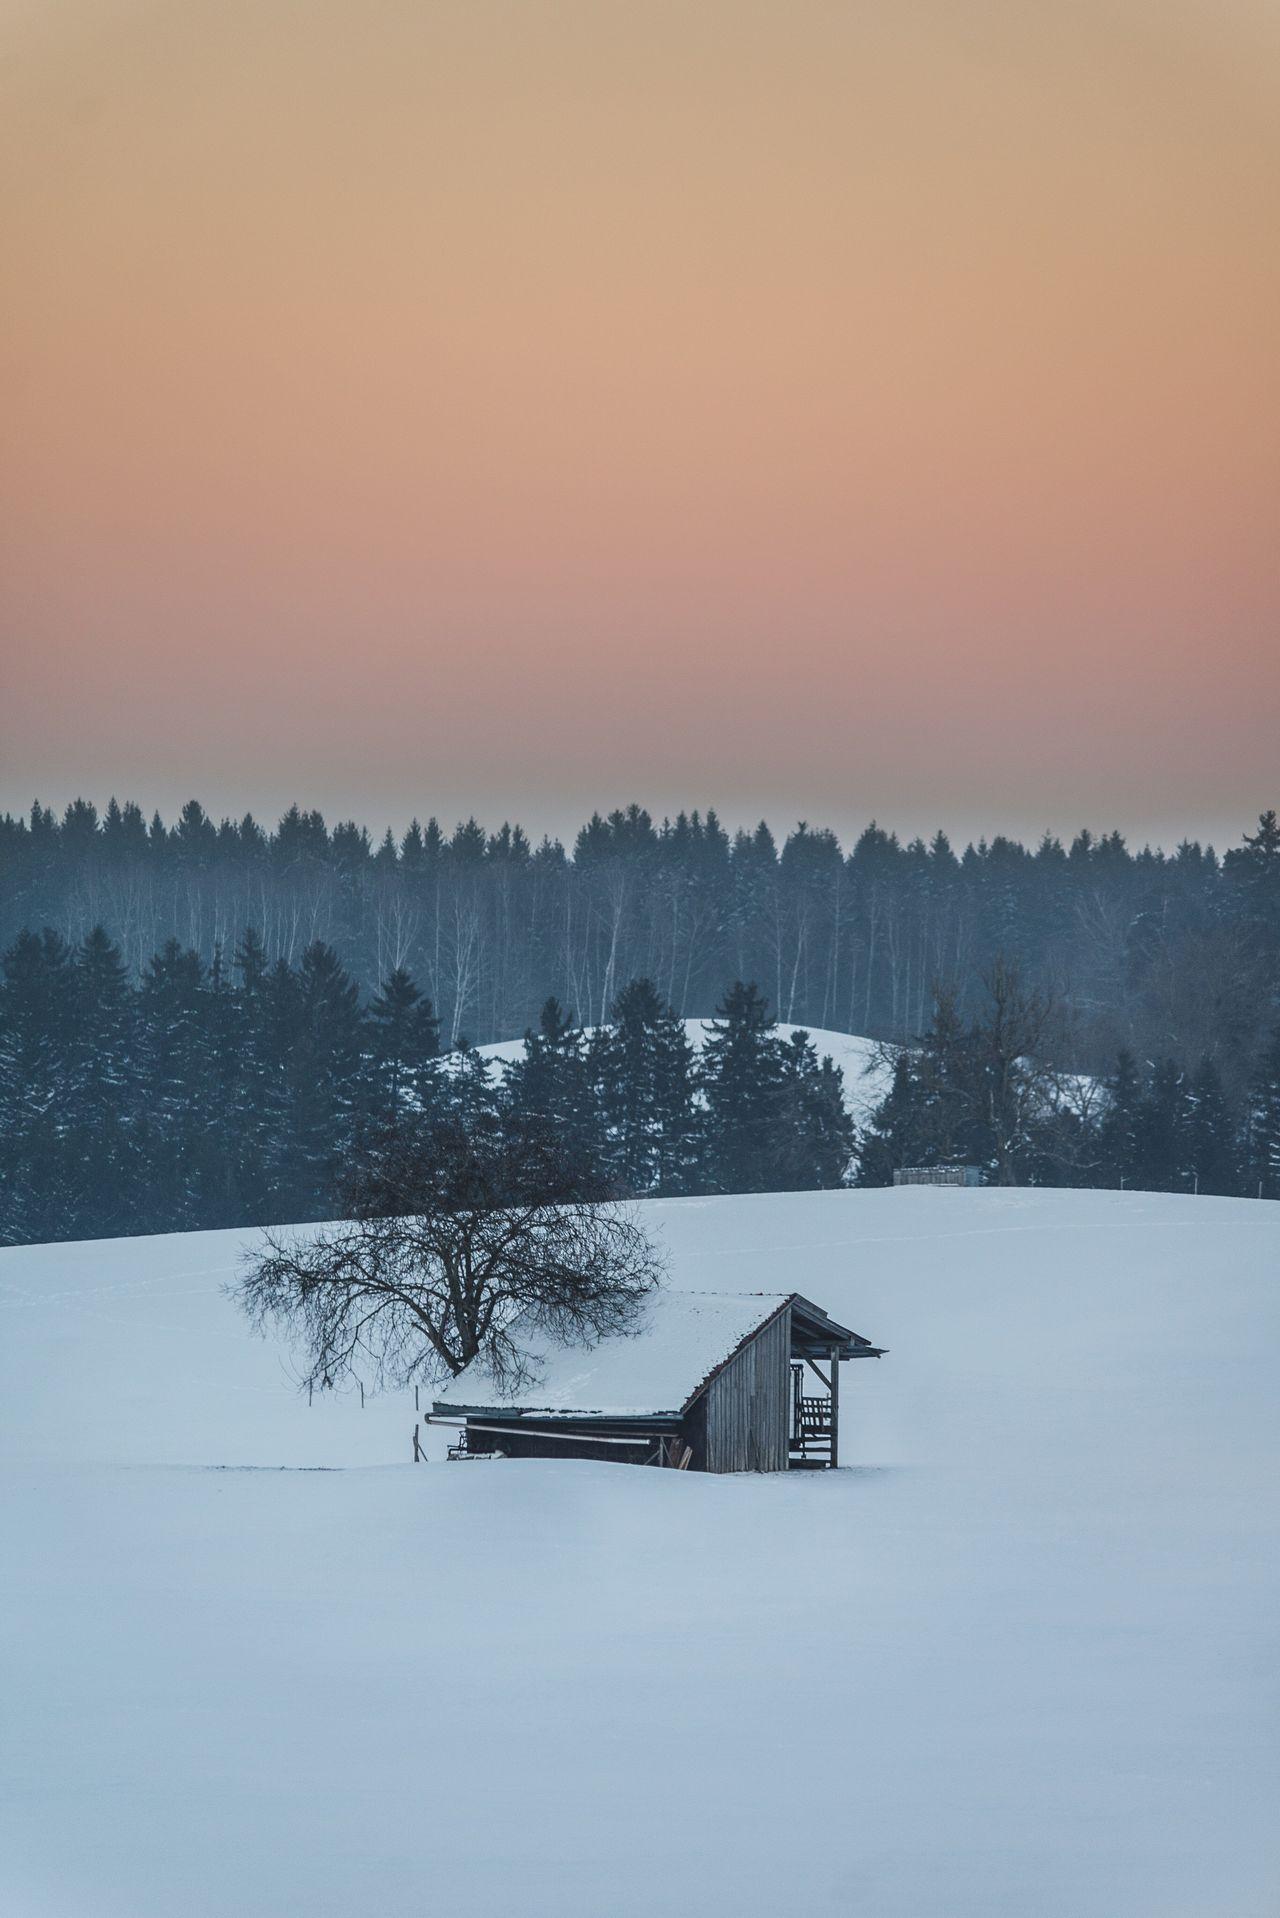 Winter Snow Nature Tree Scenics Shack